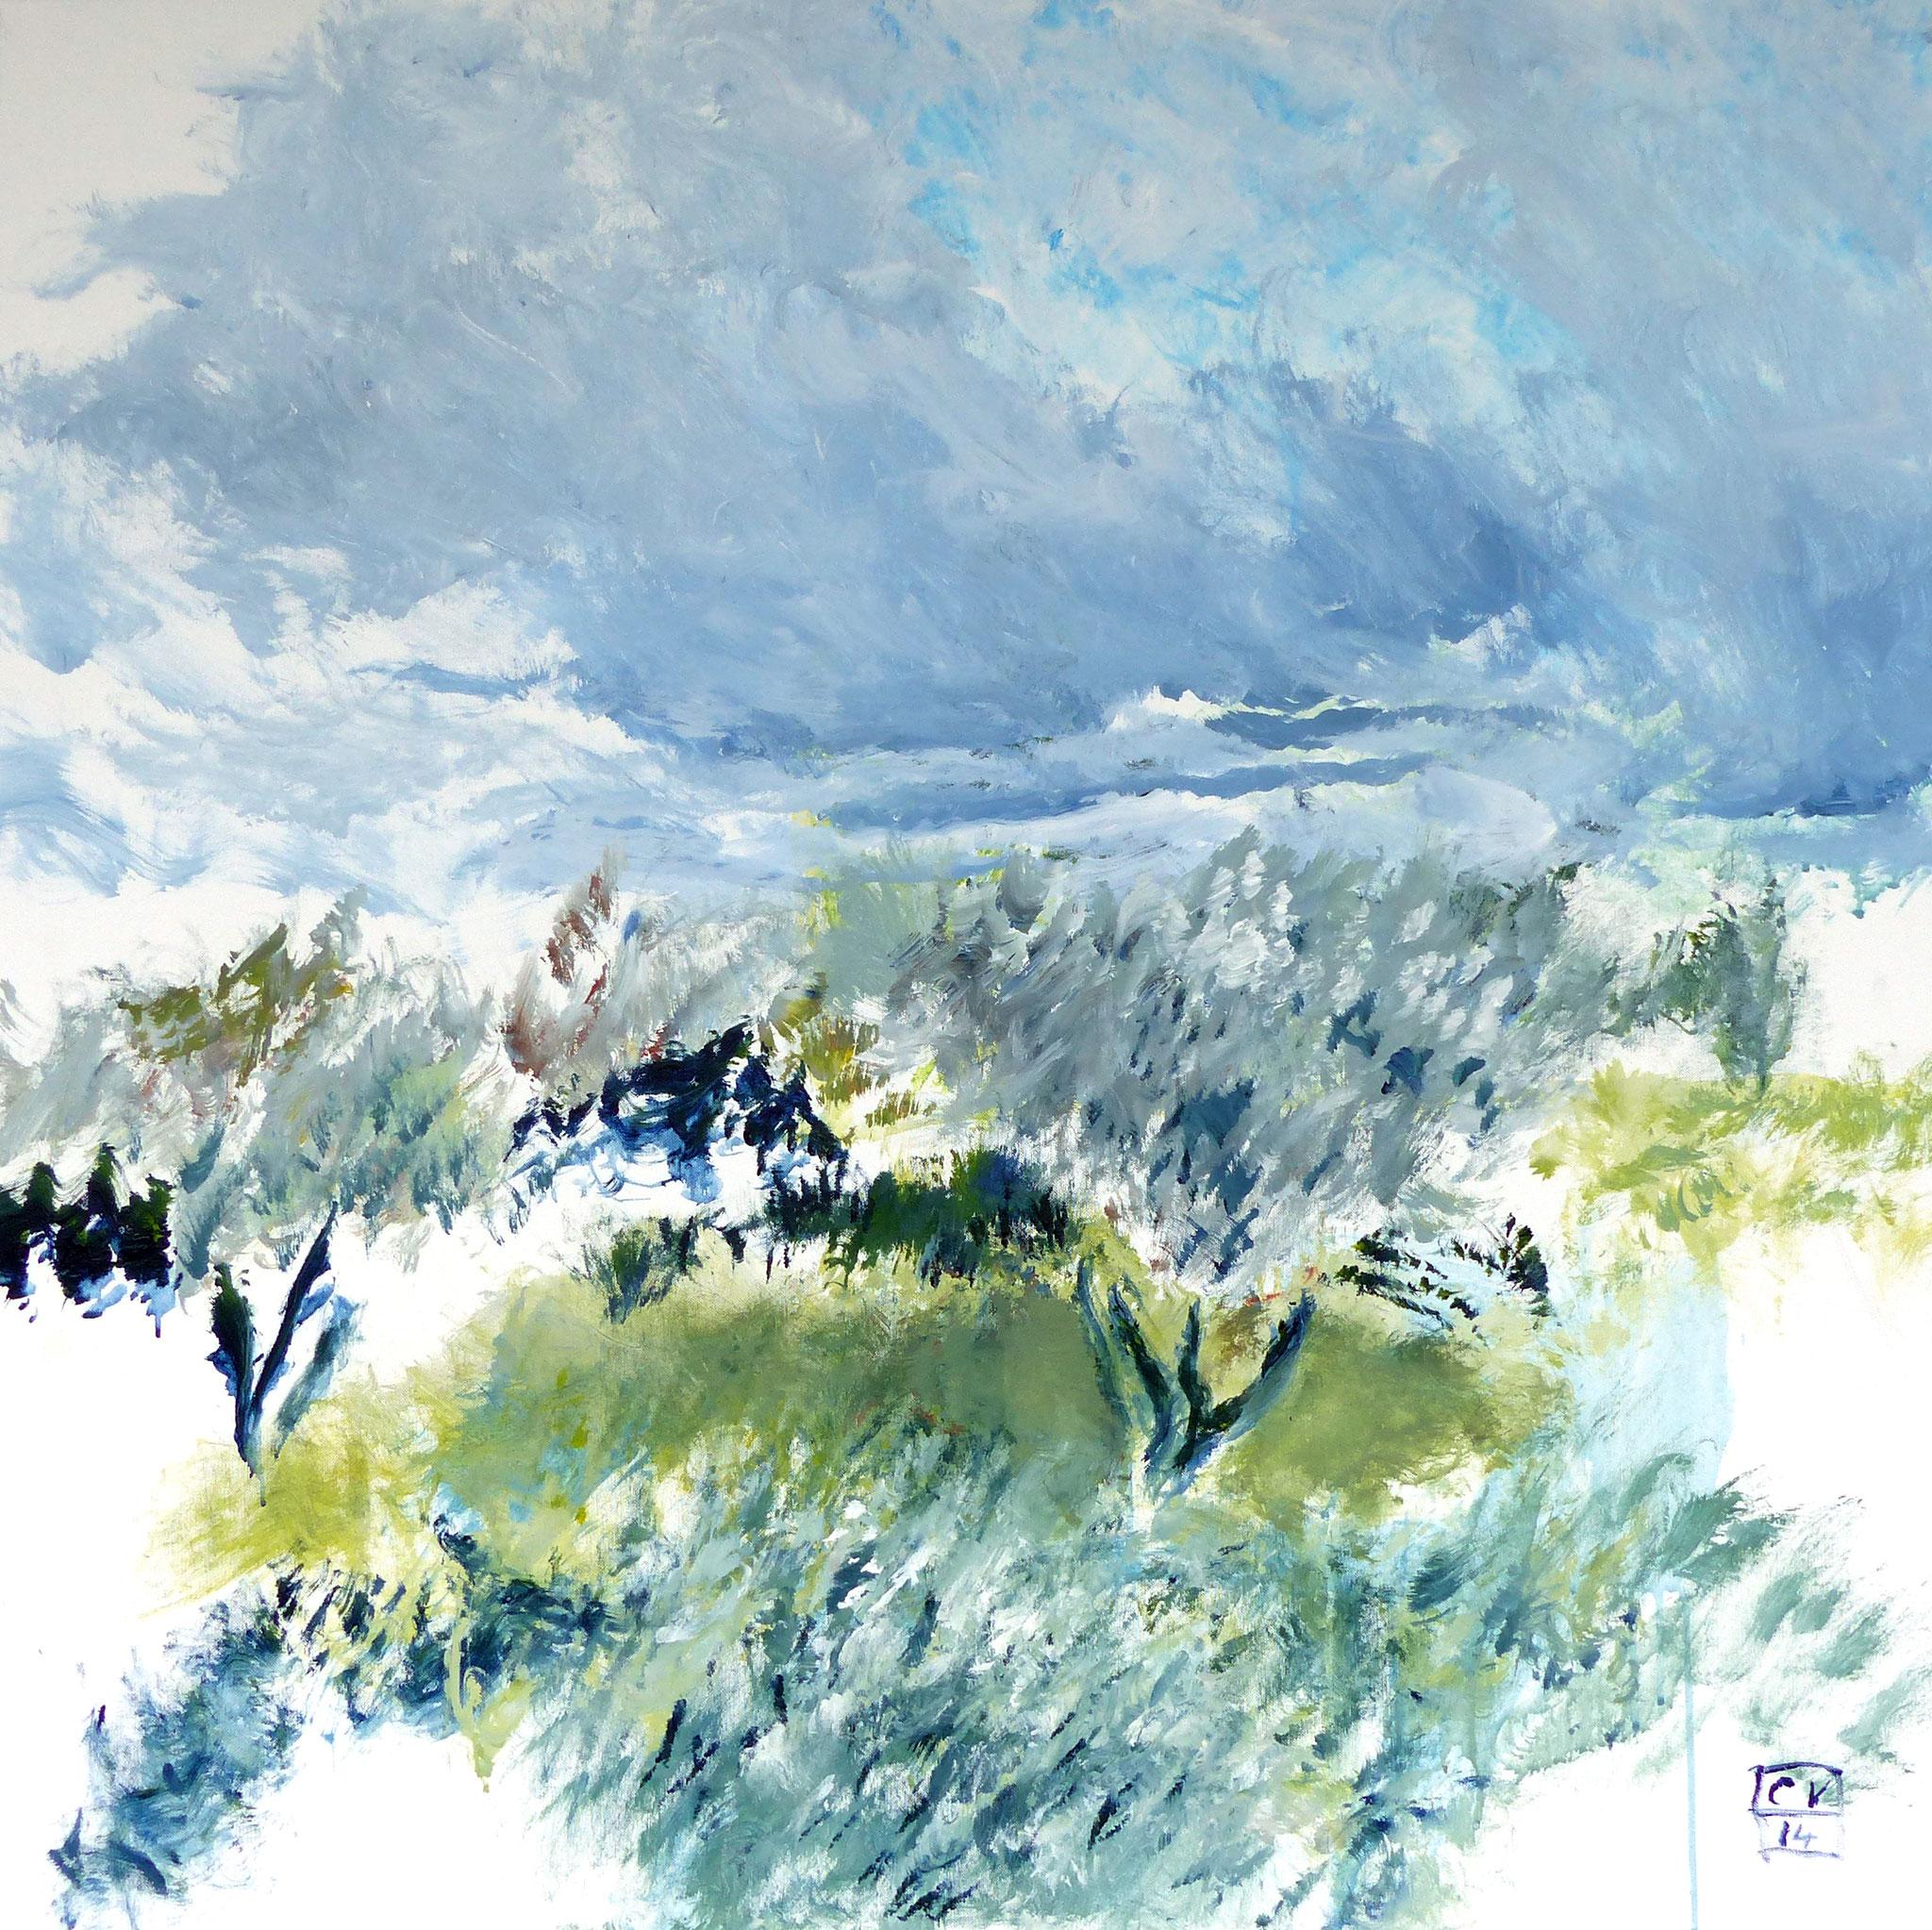 Oliveraie grise - 2014 - 100 x 100 cm